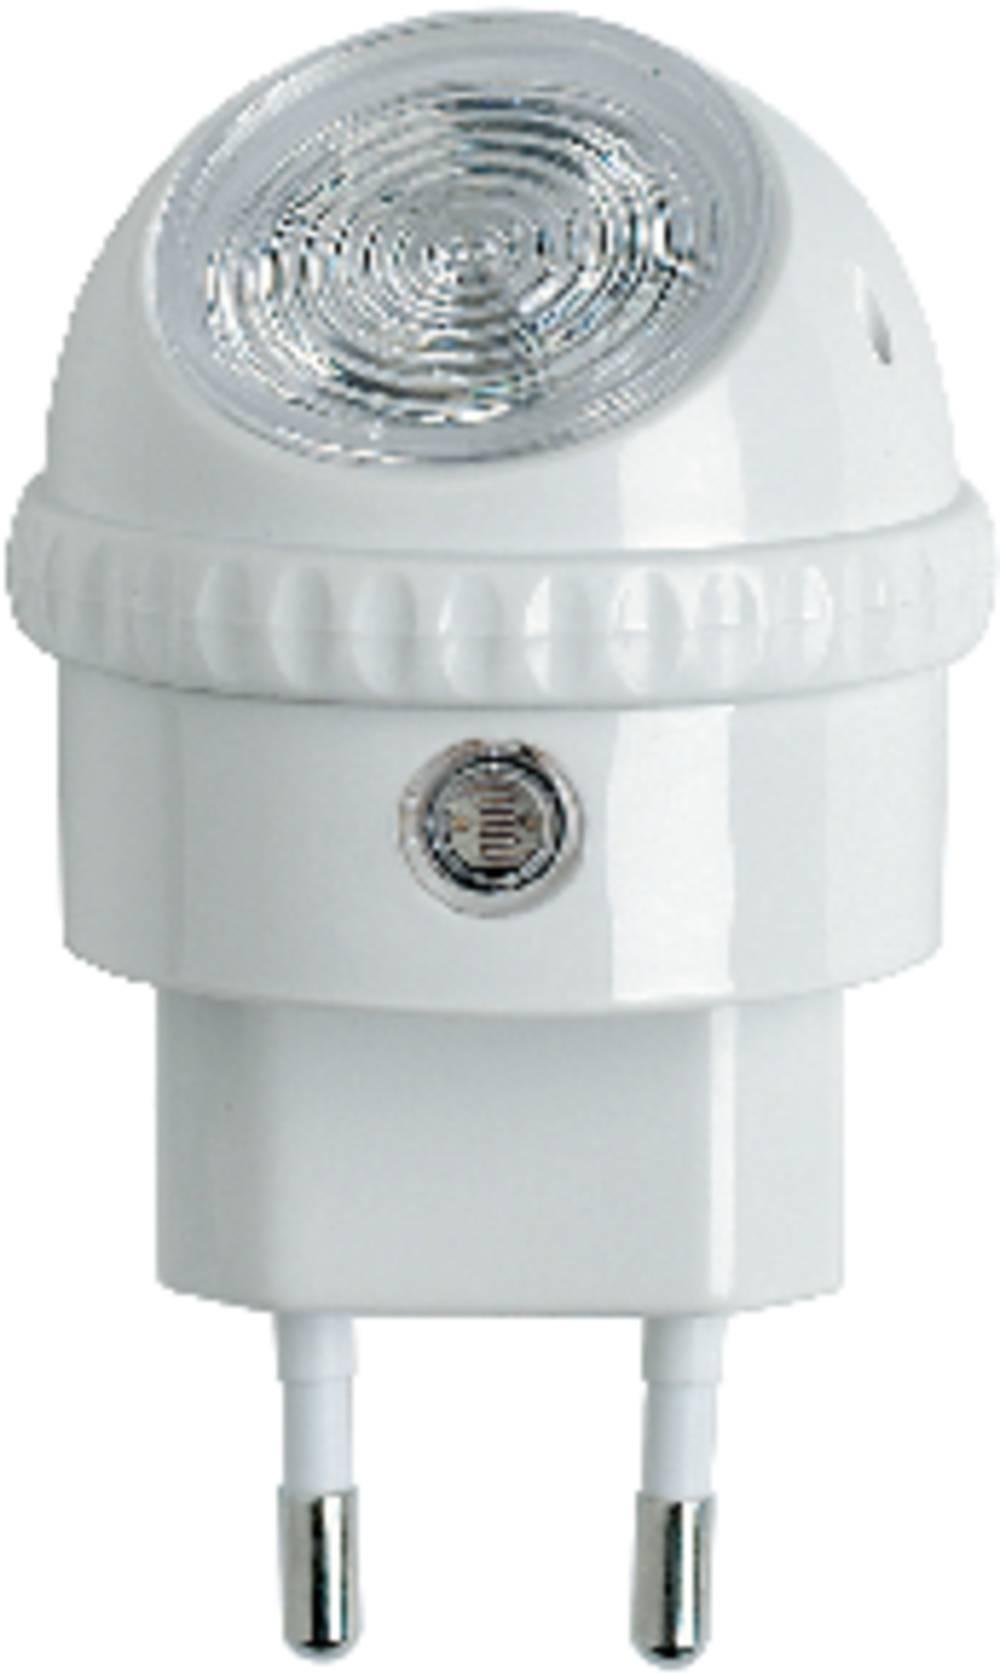 LED-nattlampa LED OSRAM Lunetta Gul Vit